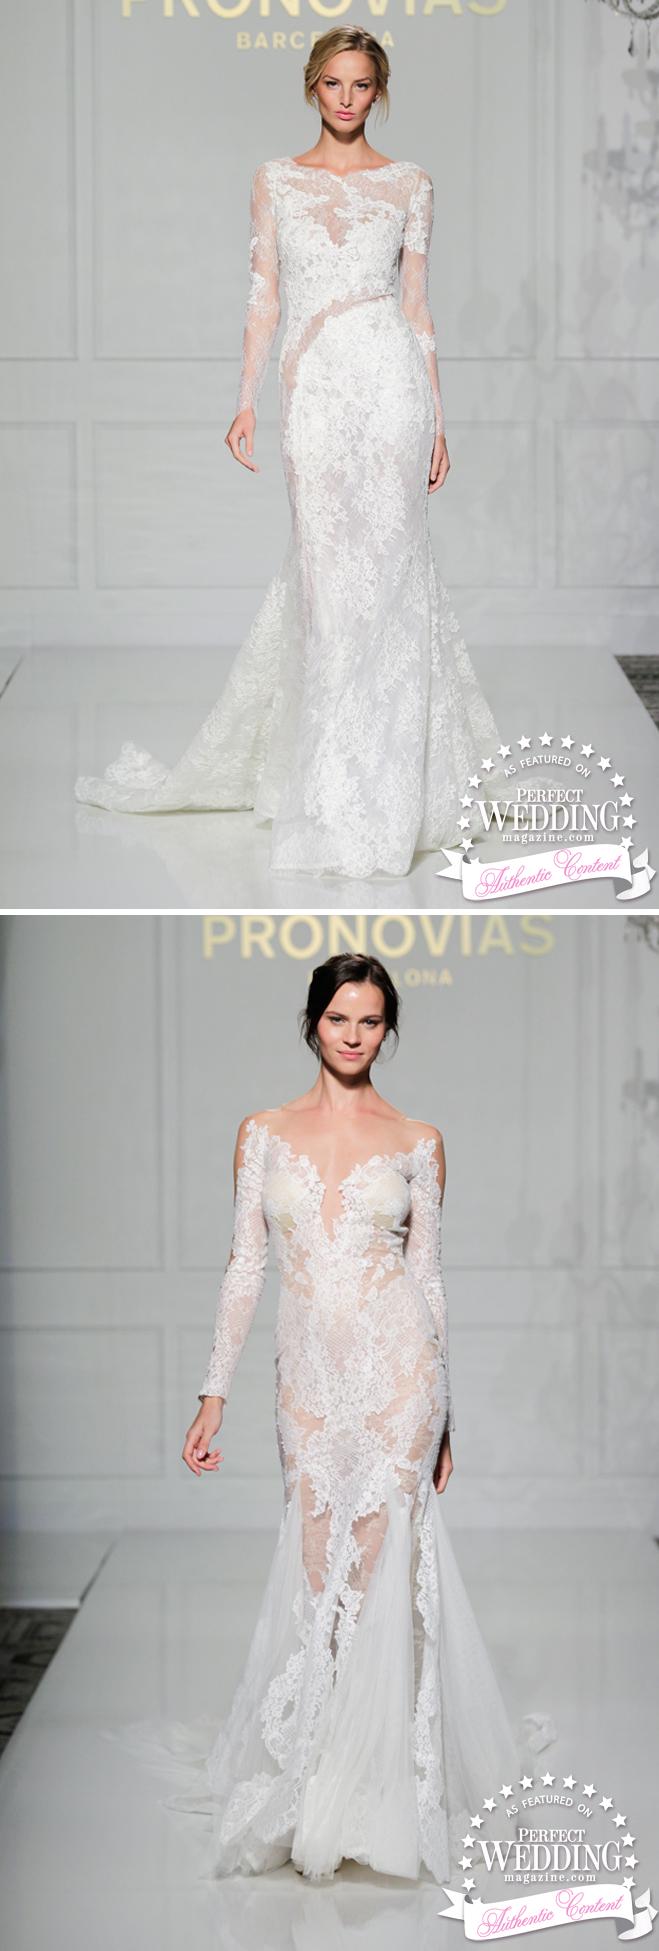 Pronovias, Atelier Pronovias, PRONOVIAS NYC FASHION SHOW, PronoviasNYCFashionShow, PronoviasItBrides, Perfect wedding Magazine Blog, Perfect Wedding magazine, 2016 Bridal collections